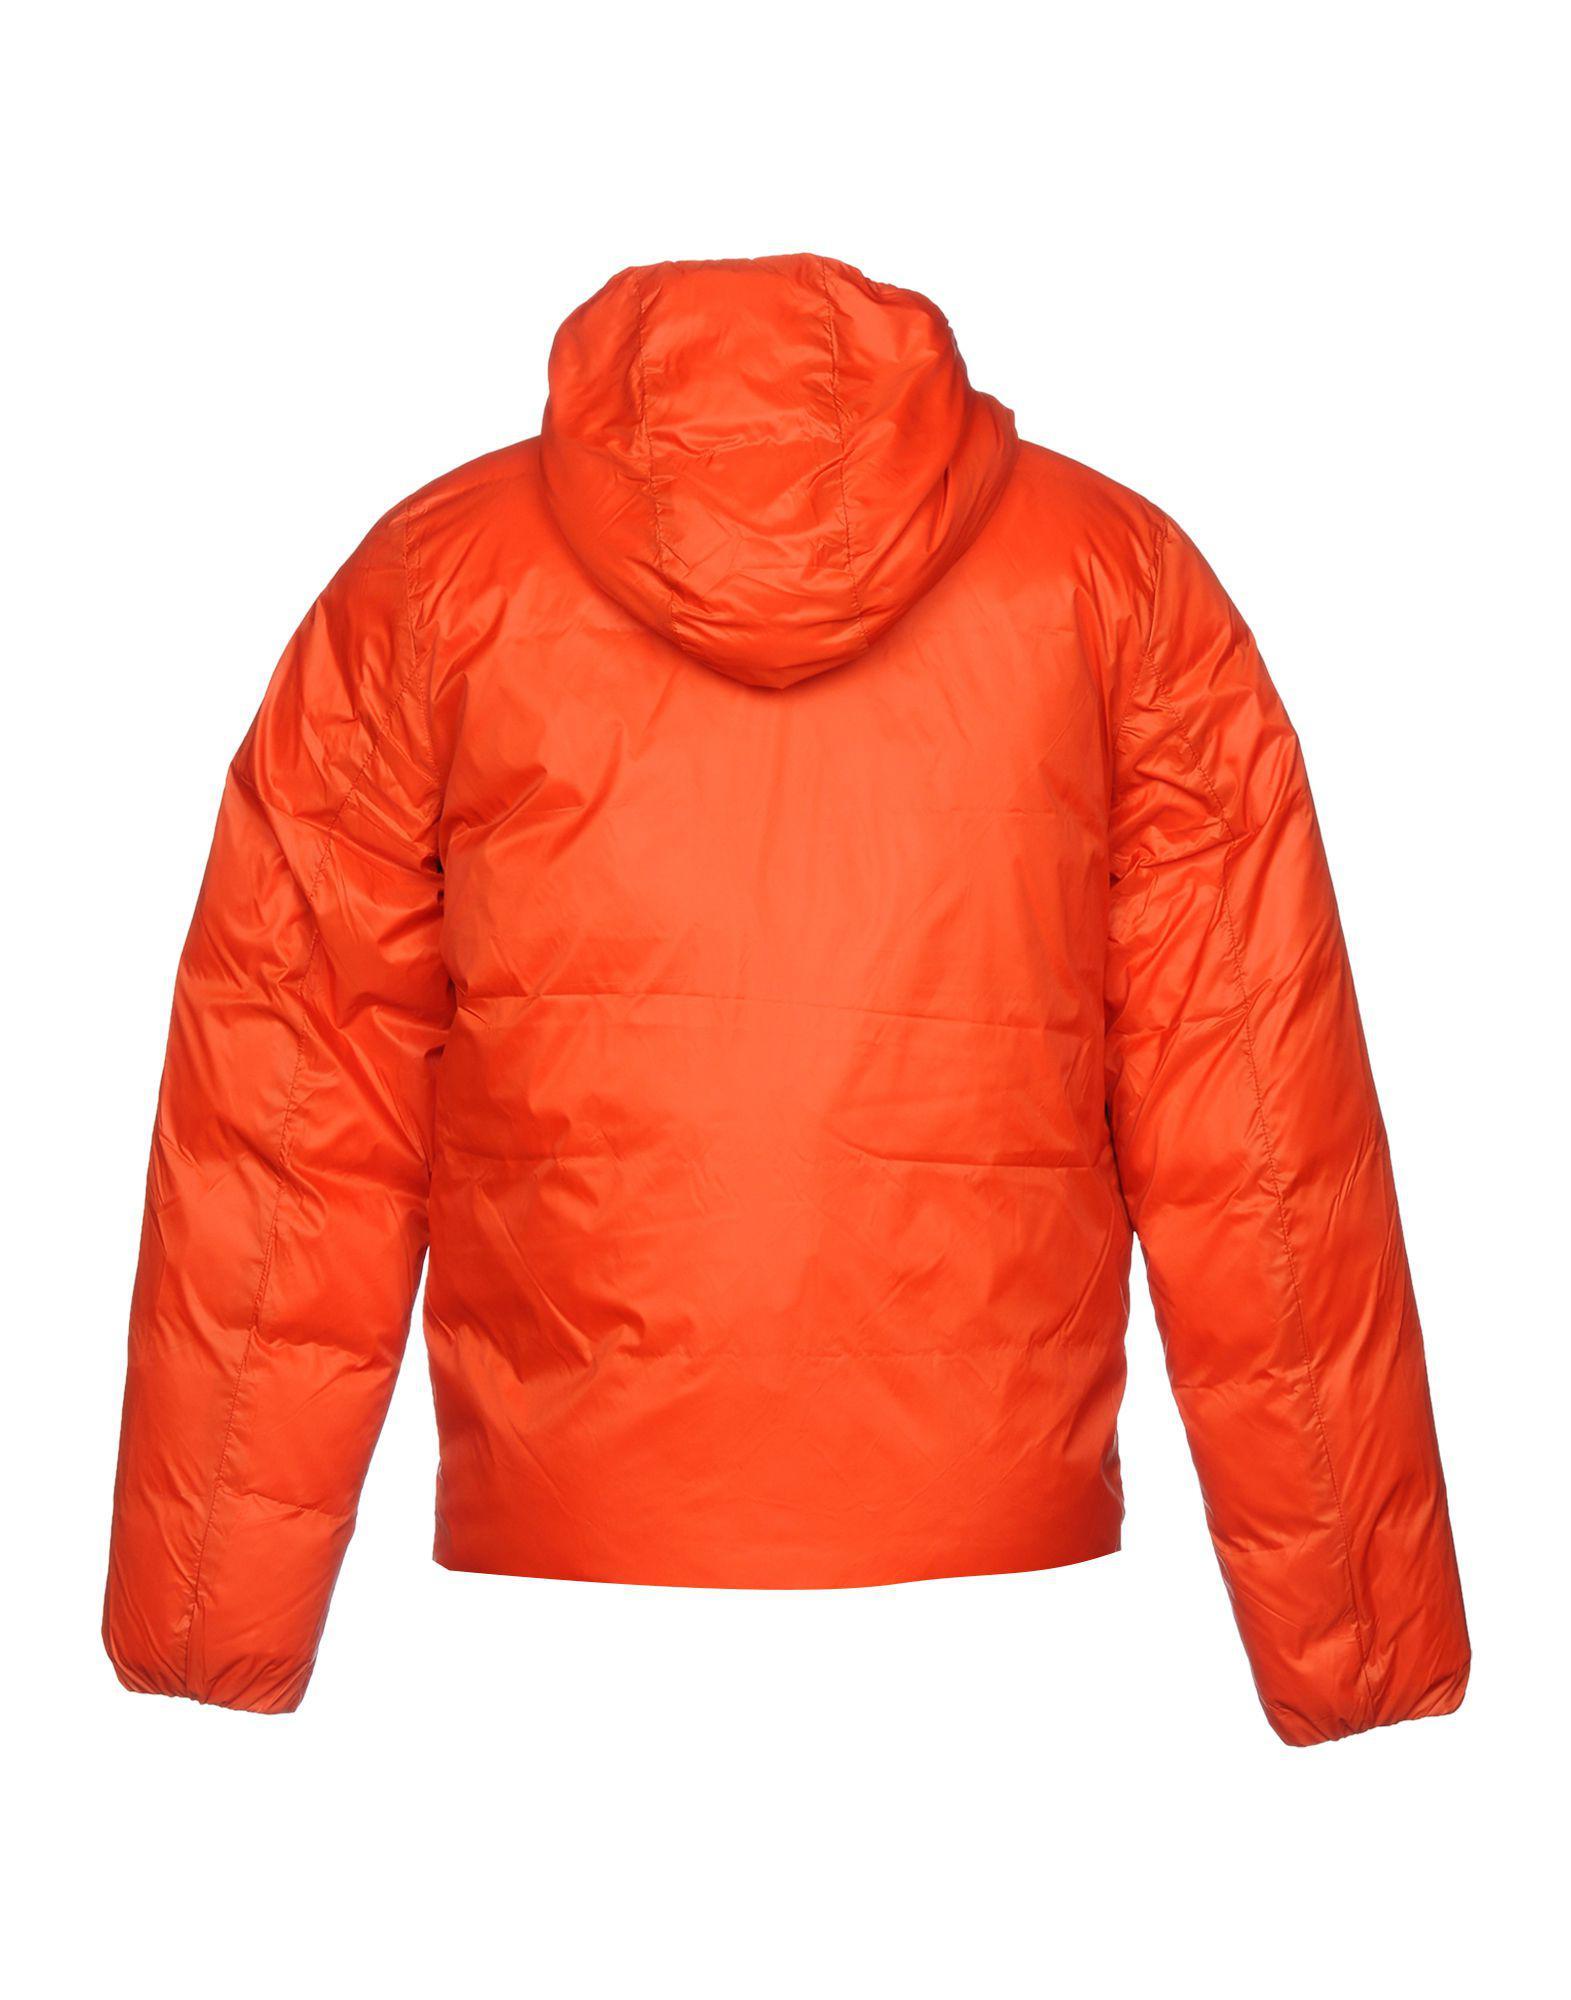 K-Way Synthetic Down Jacket in Rust (Orange) for Men